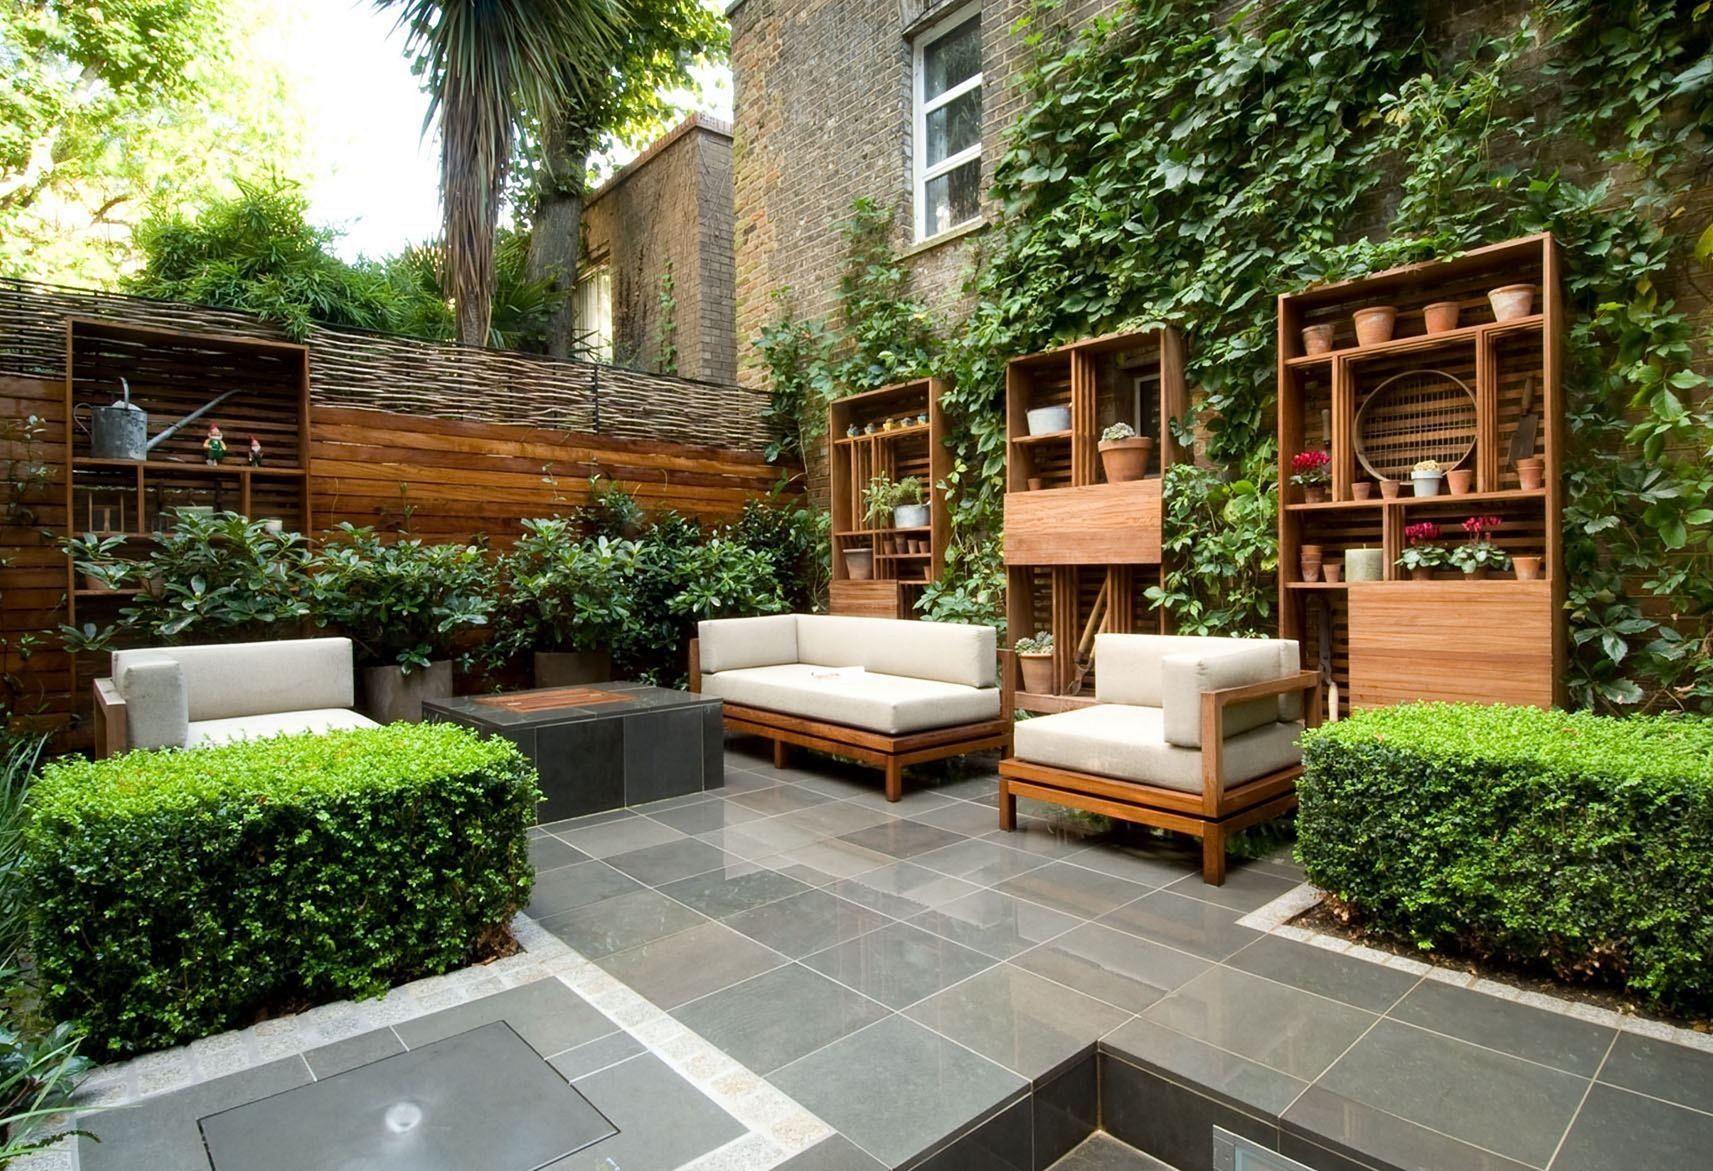 10 Wonderful Small Backyard Design Ideas On a Budget ...